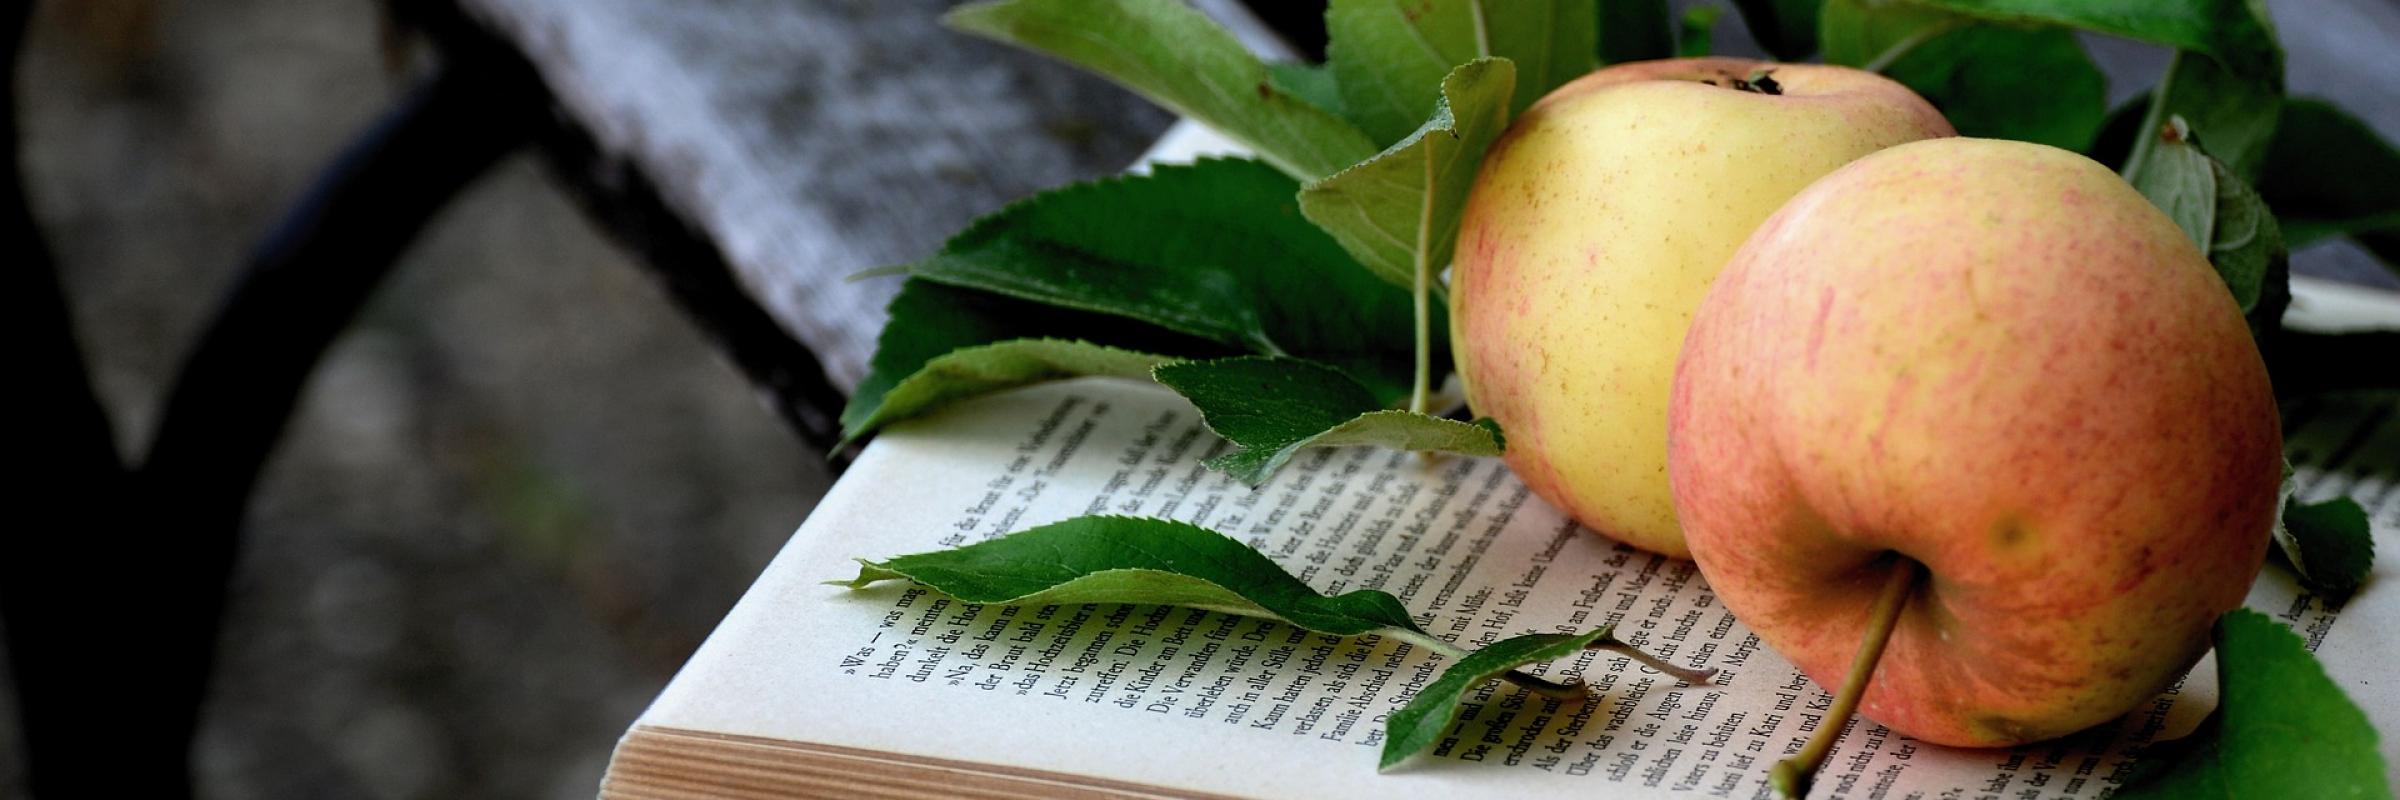 apple-3688919_1920